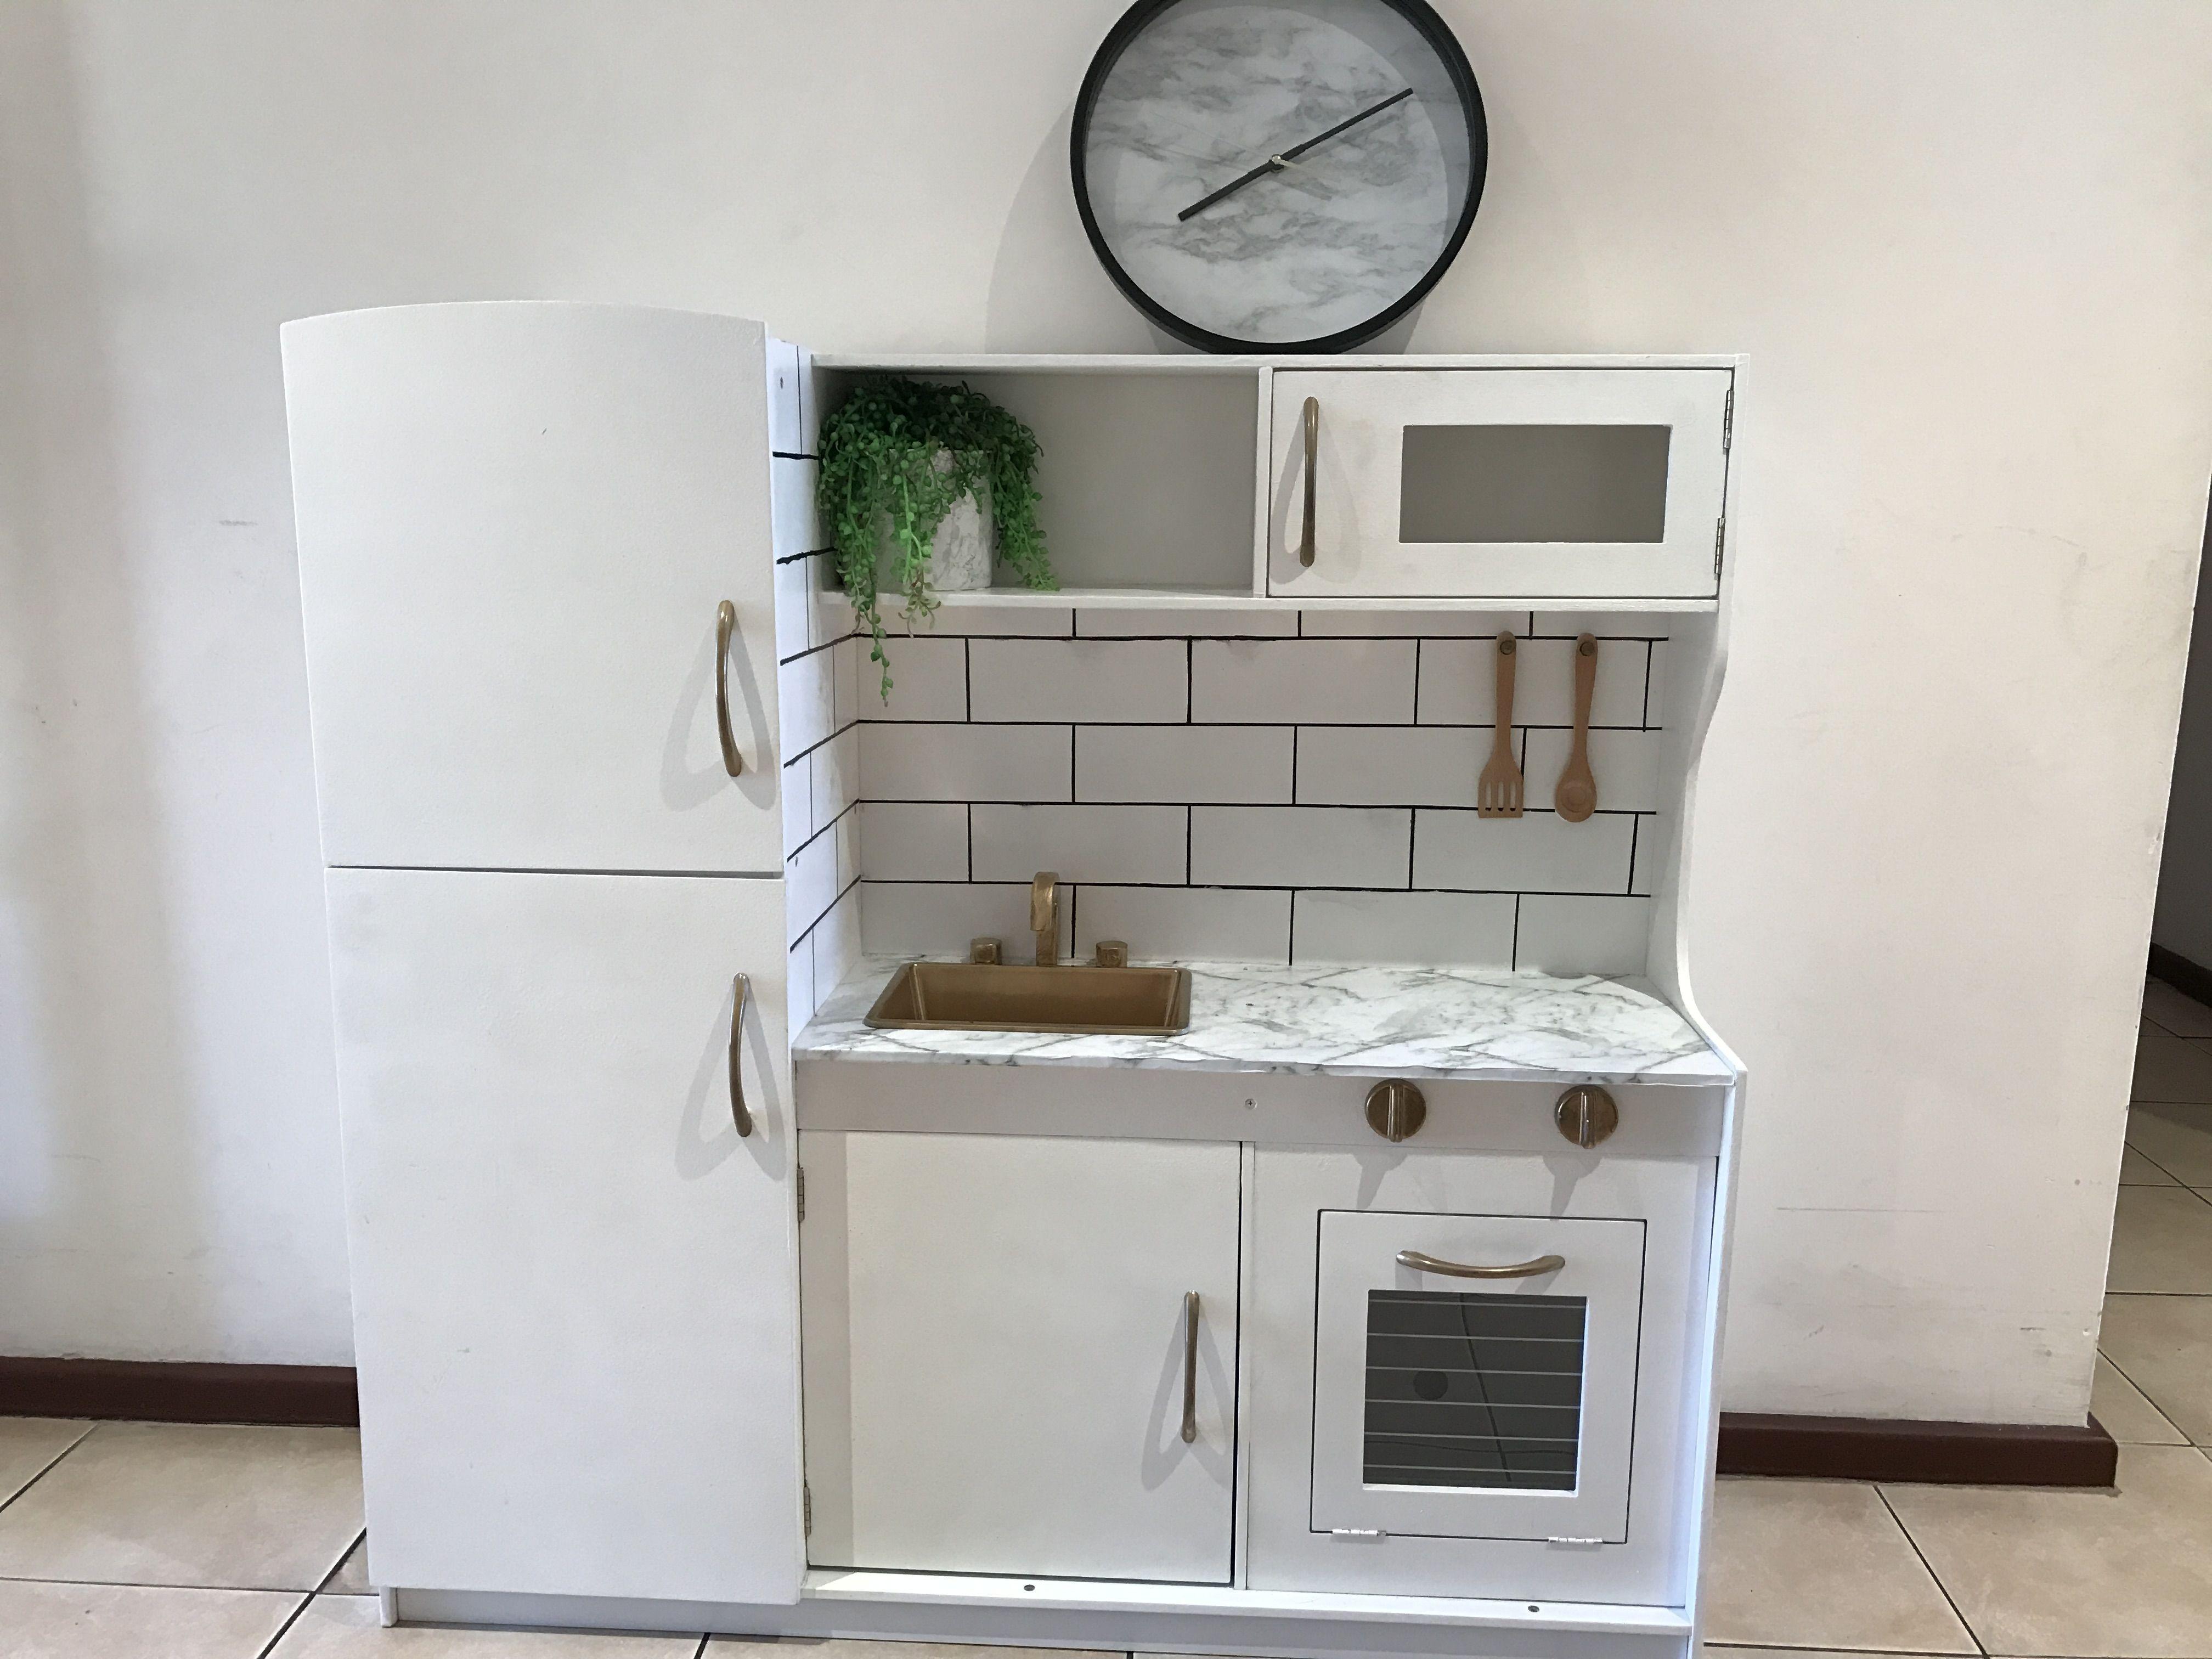 kmart kids kitchen hack in 2019 diy kids furniture kmart toy kitchen kids toy kitchen on kitchen ideas kmart id=17768